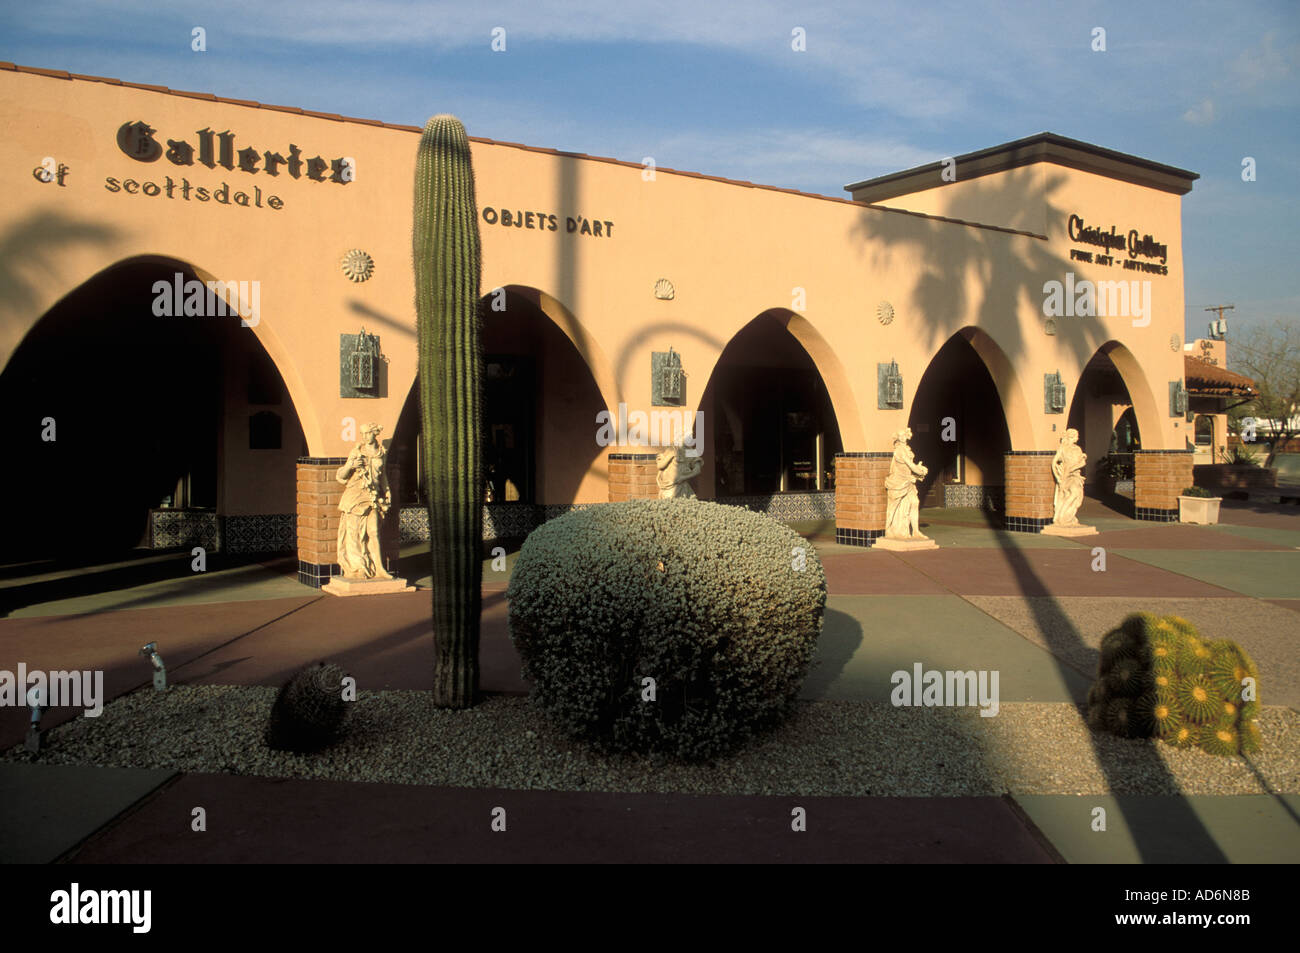 Art Gallery, Main Street, Old Town, Scottsdale, Arizona